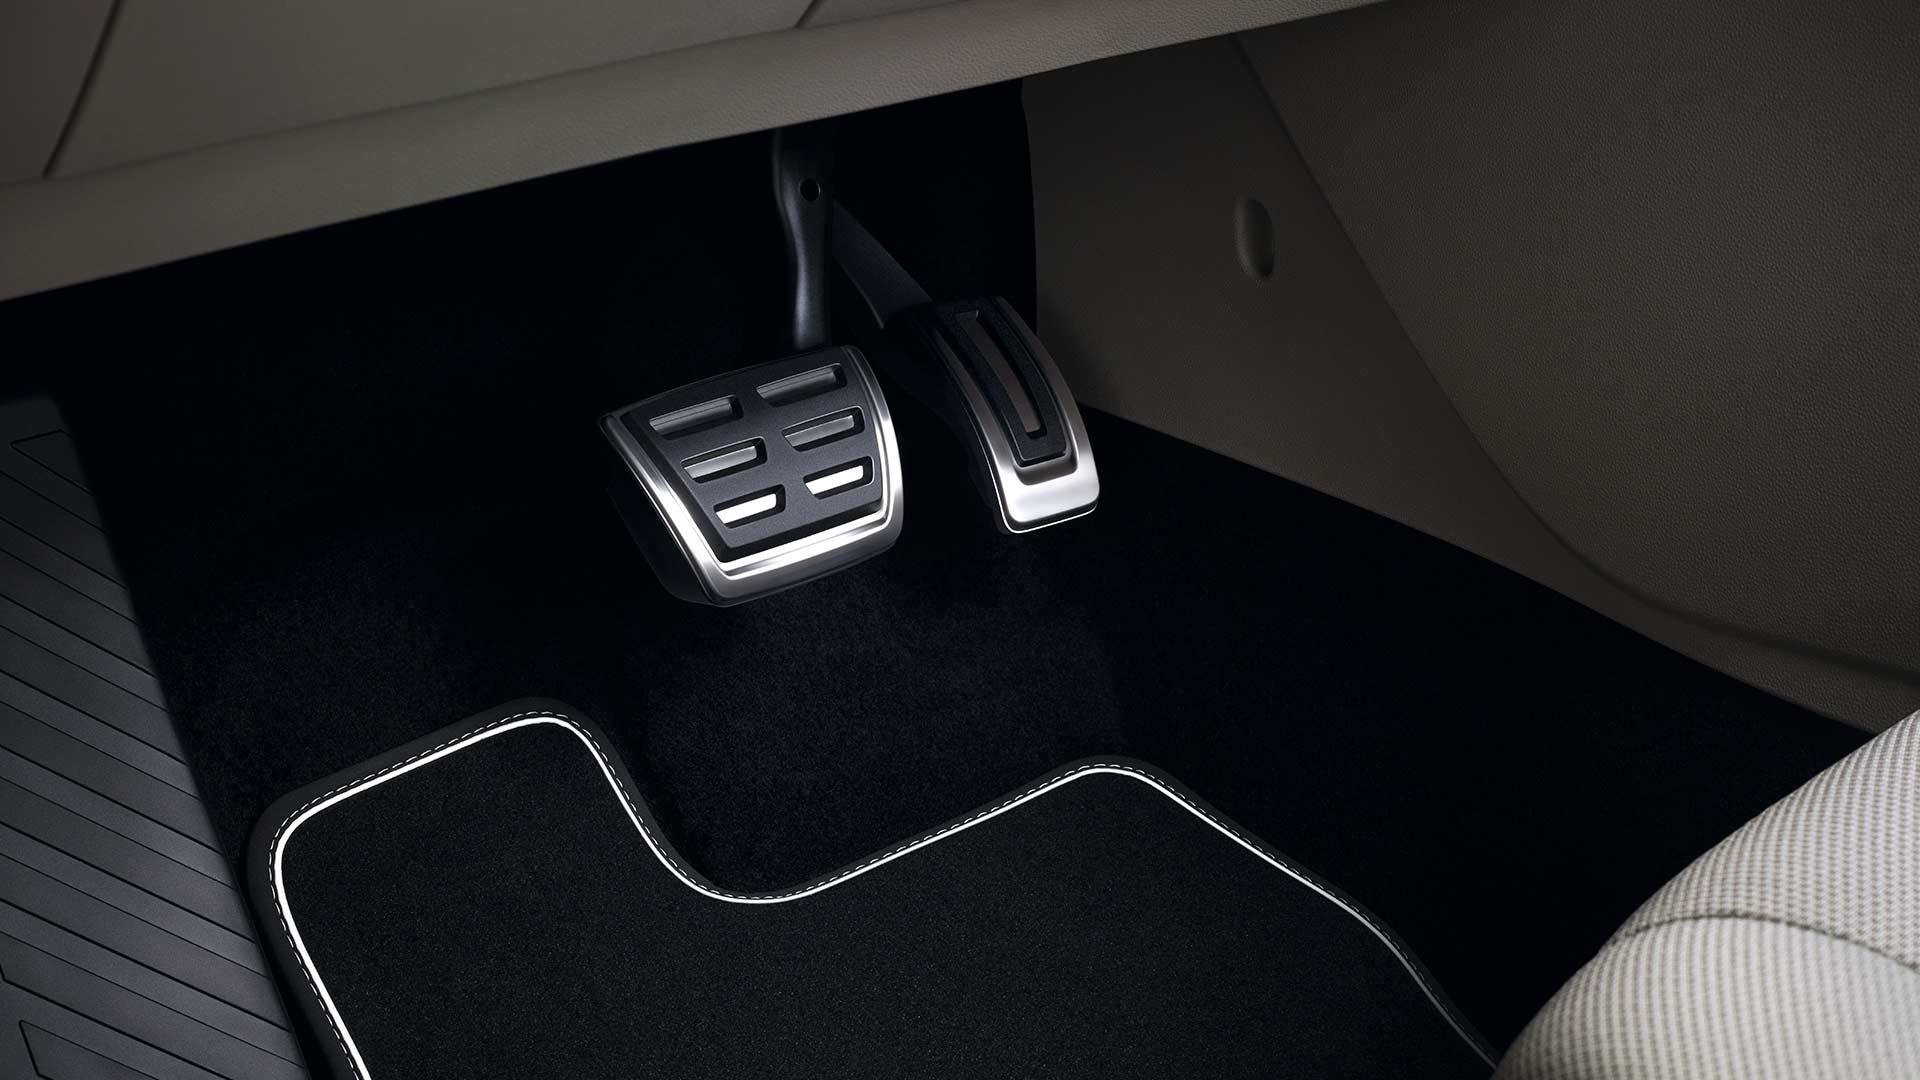 Fundas para pedales para tu auto Volkswagen Jetta A7 seminuevo.